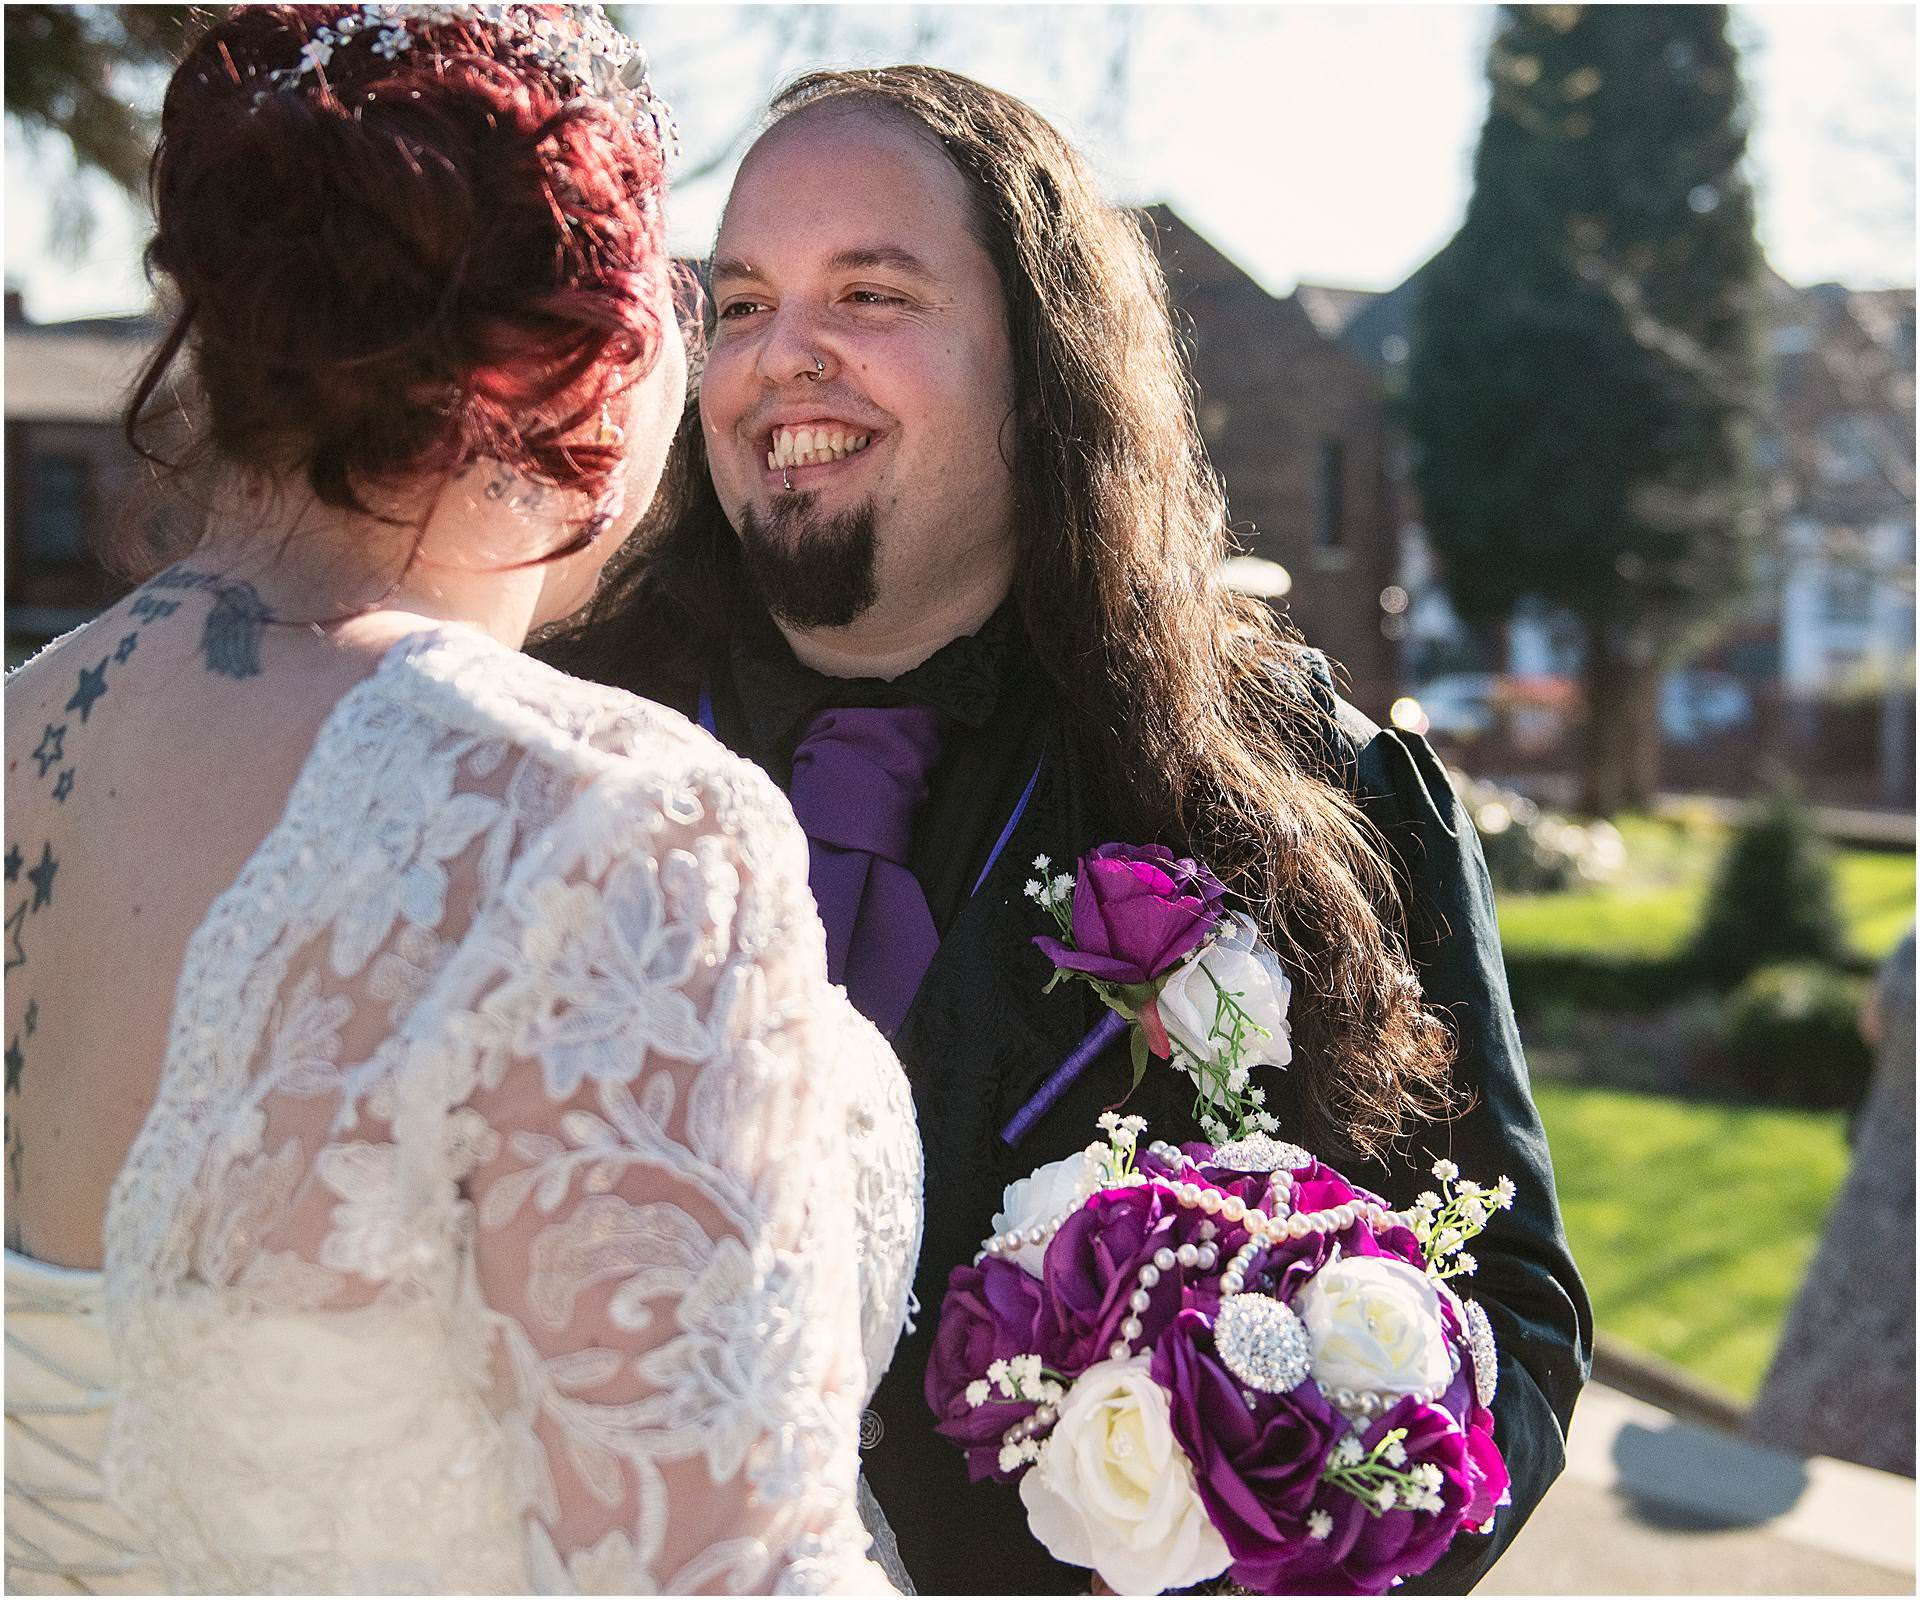 wedding_photography at dukinfield_townhall with sarah_bee_photography dukinfield_park dukinfeild_cheshire_2007.jpg